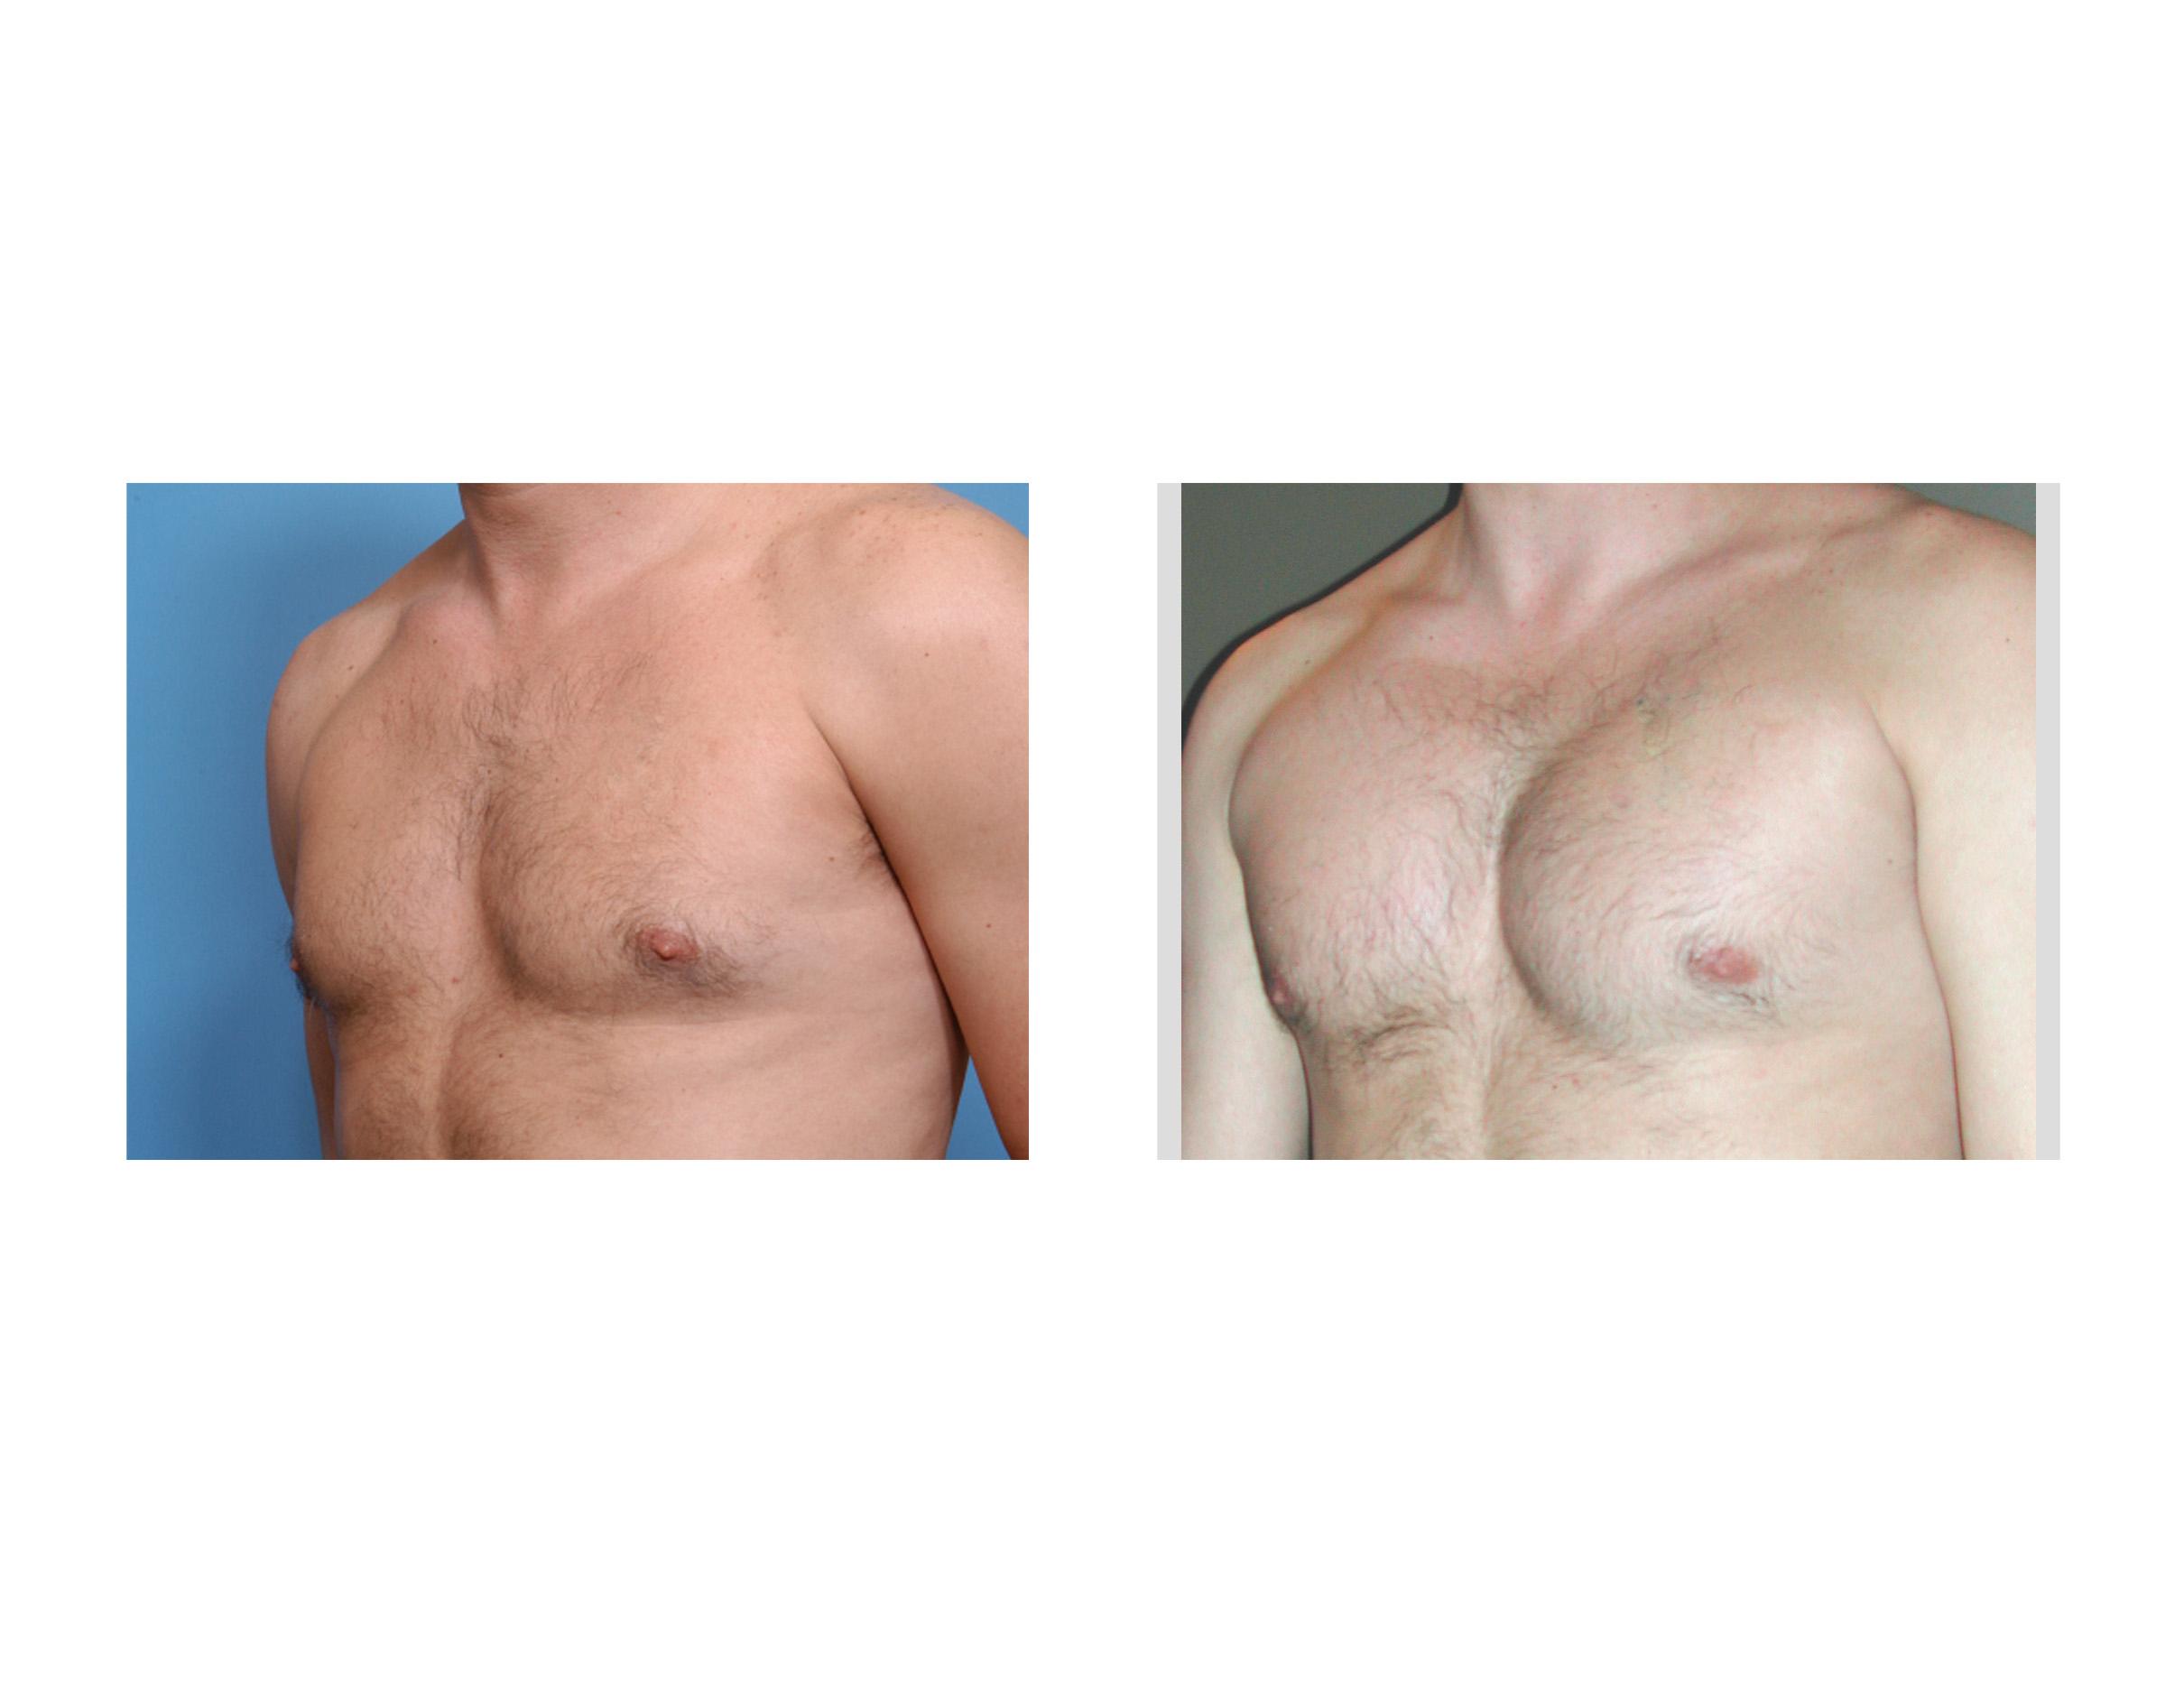 breast indianapolis Augmentation